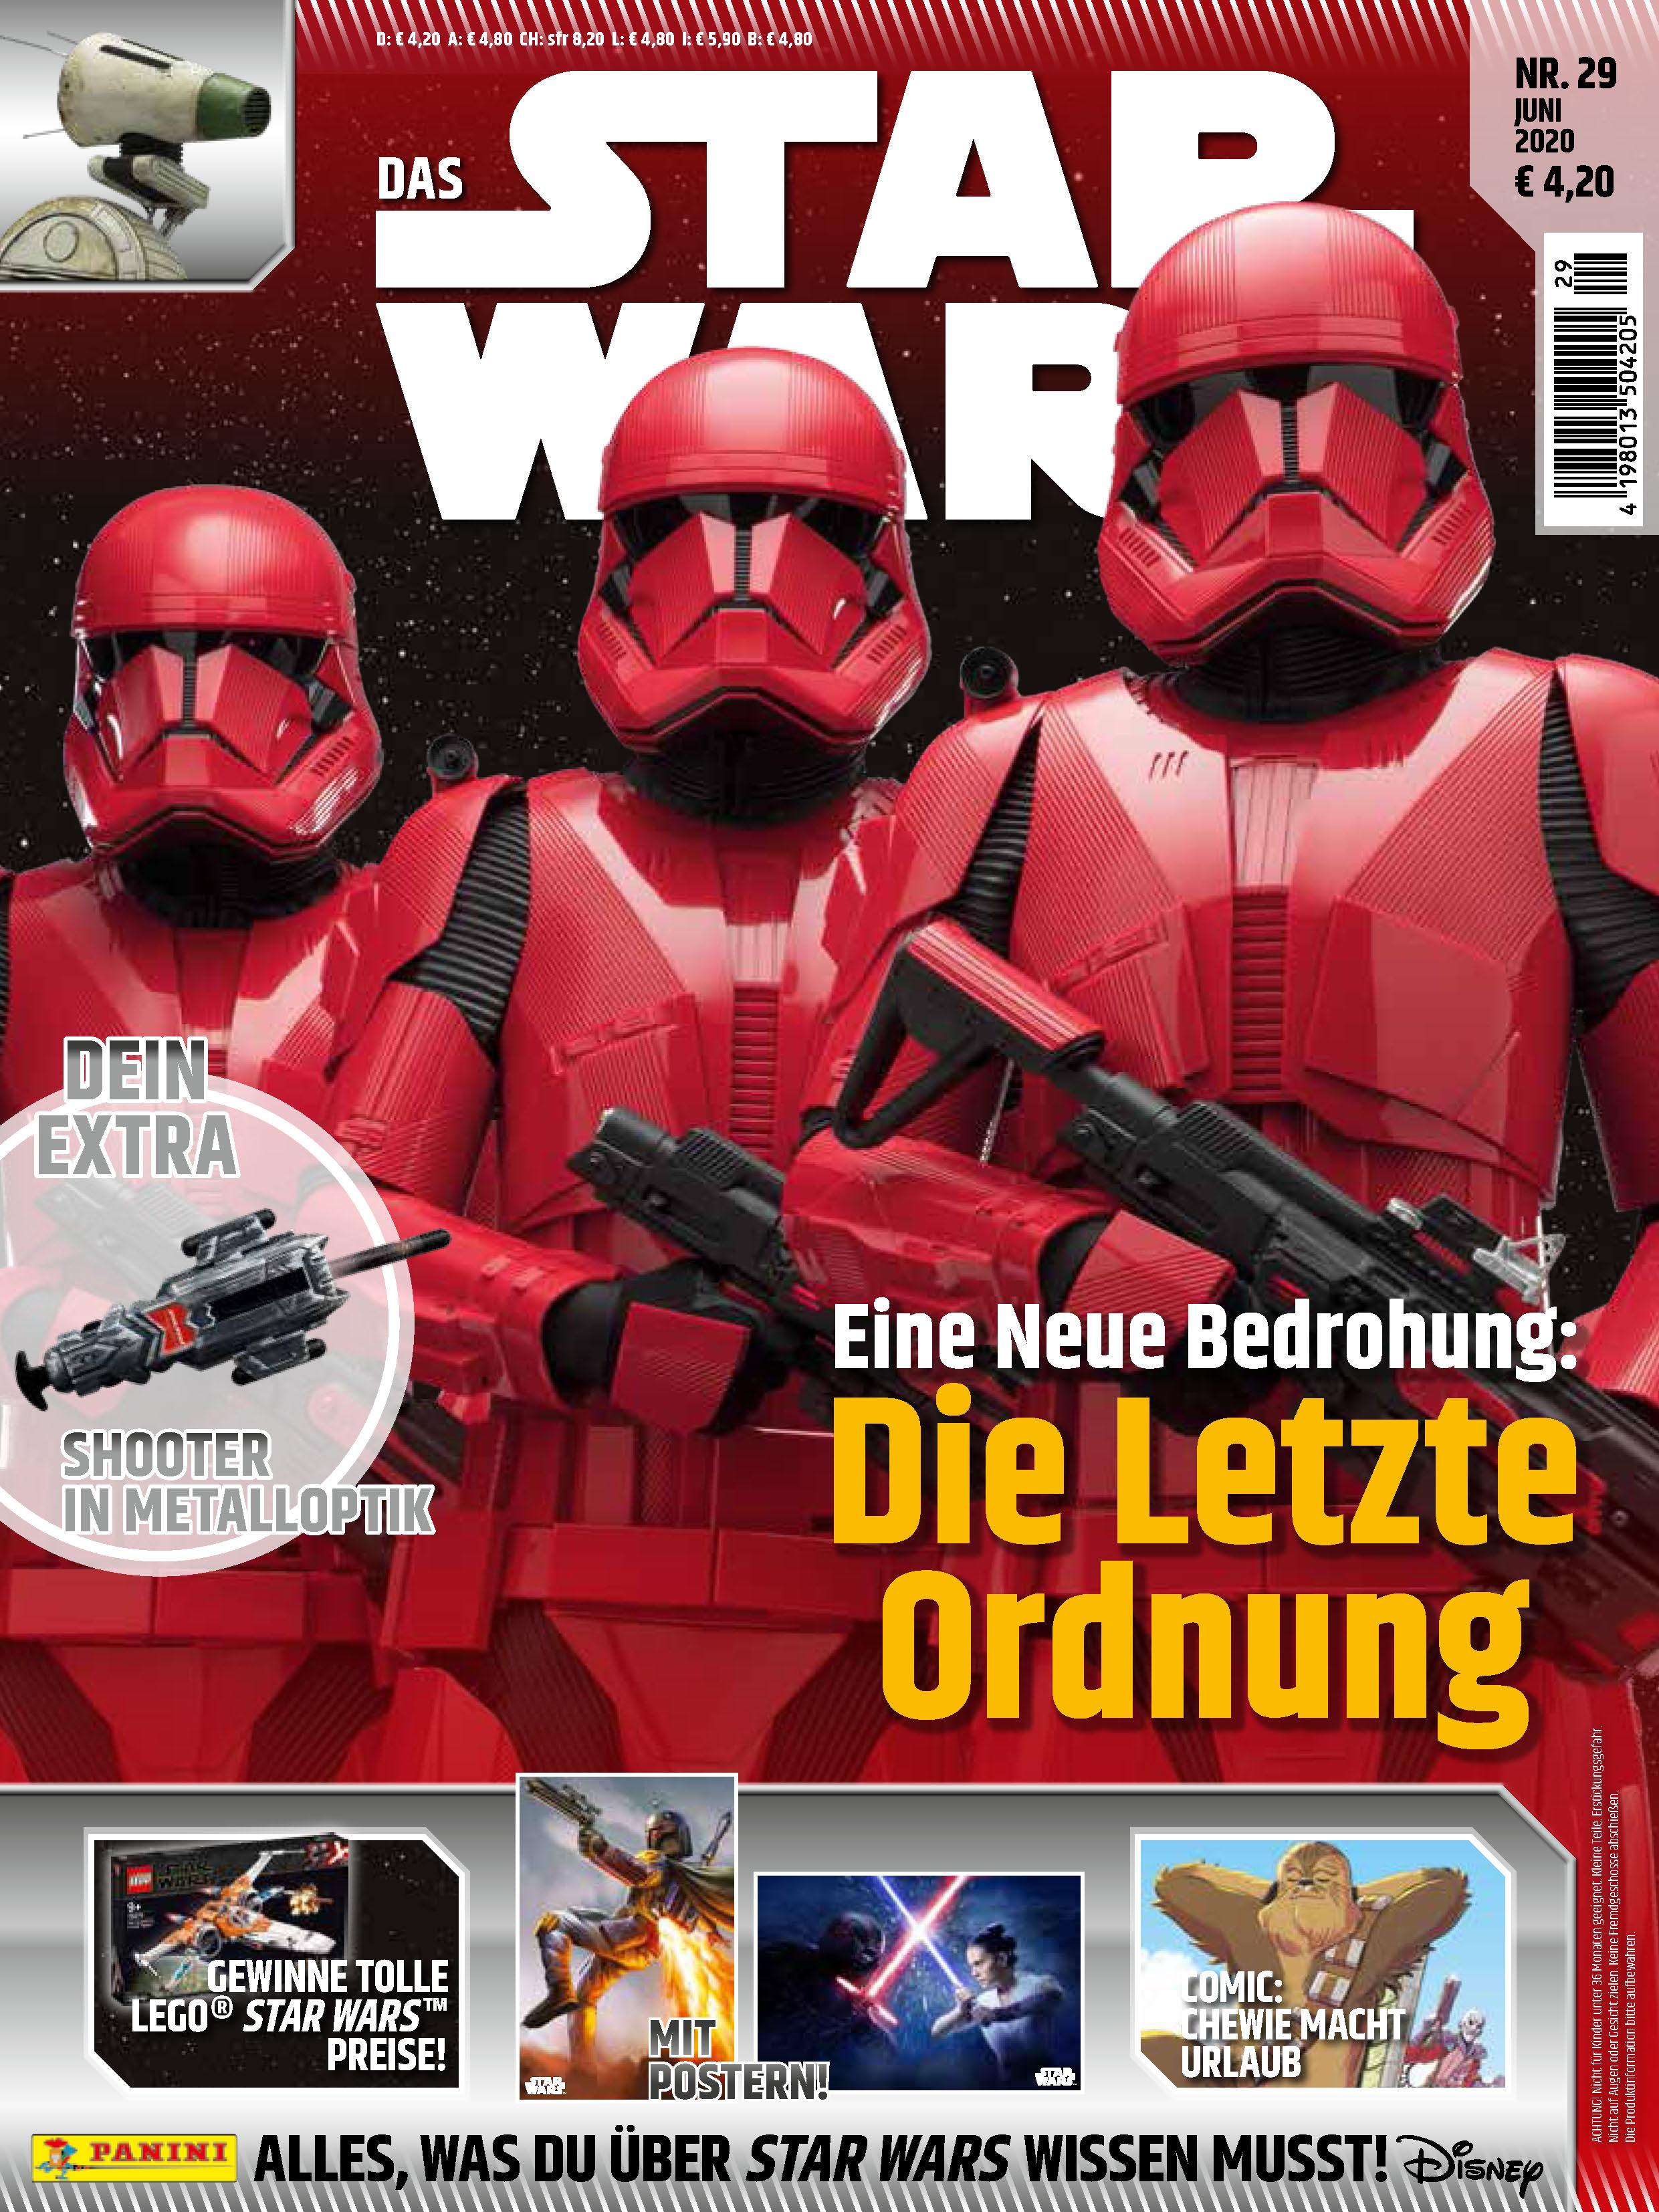 Star Wars Universum 29